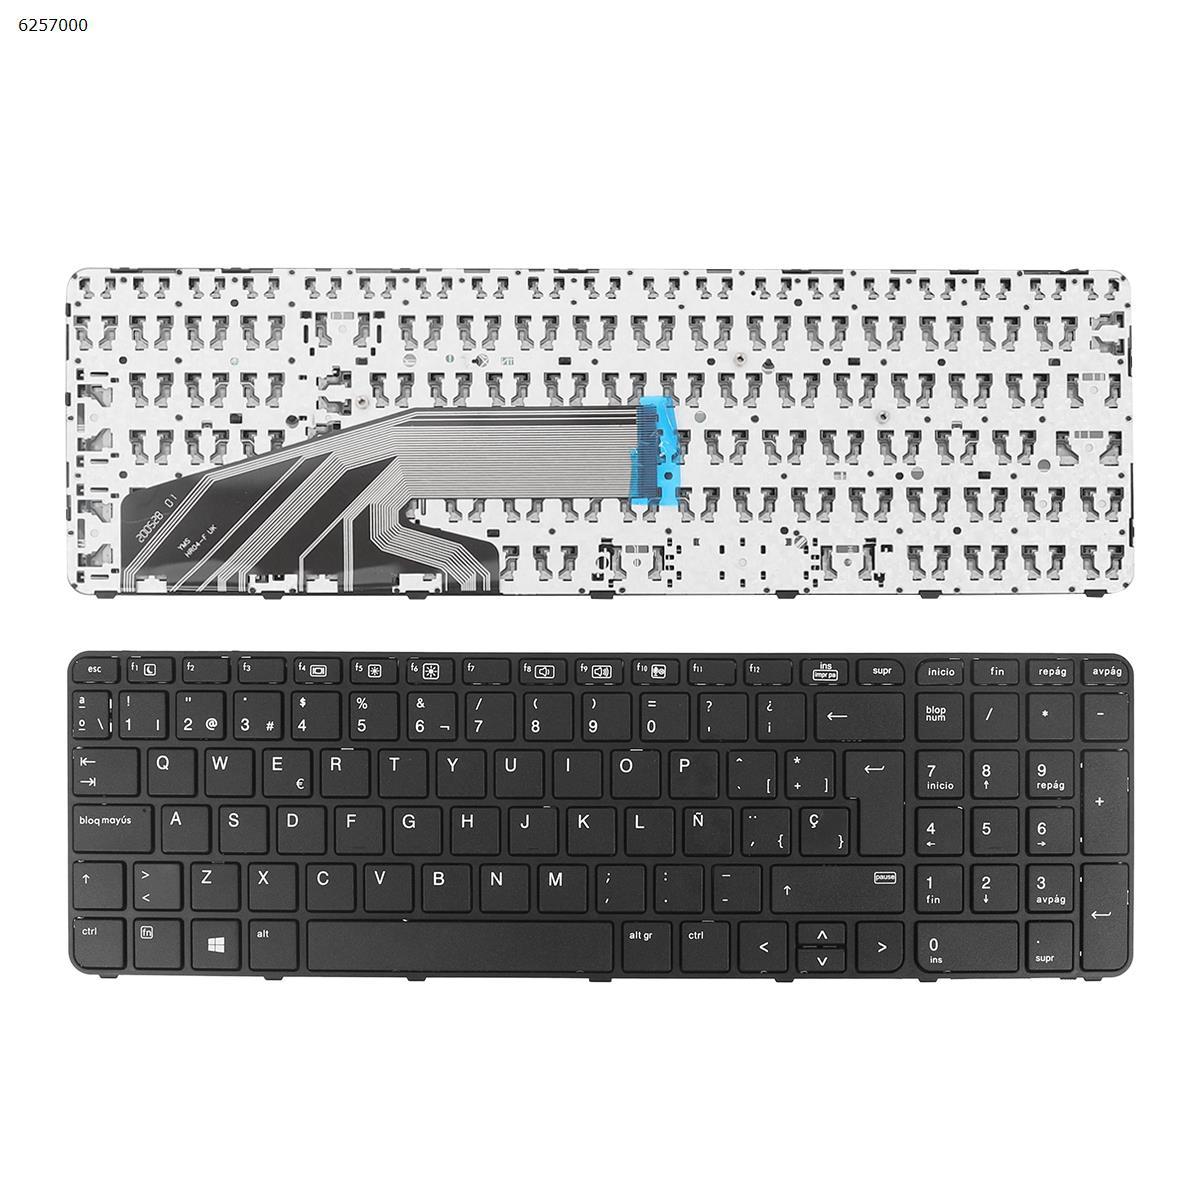 SP الاسبانية الجديدة استبدال لوحة مفاتيح إتش بي Probook 650 G2 655 G2 650 G3 655 G3 المحمول الأسود مع الإطار